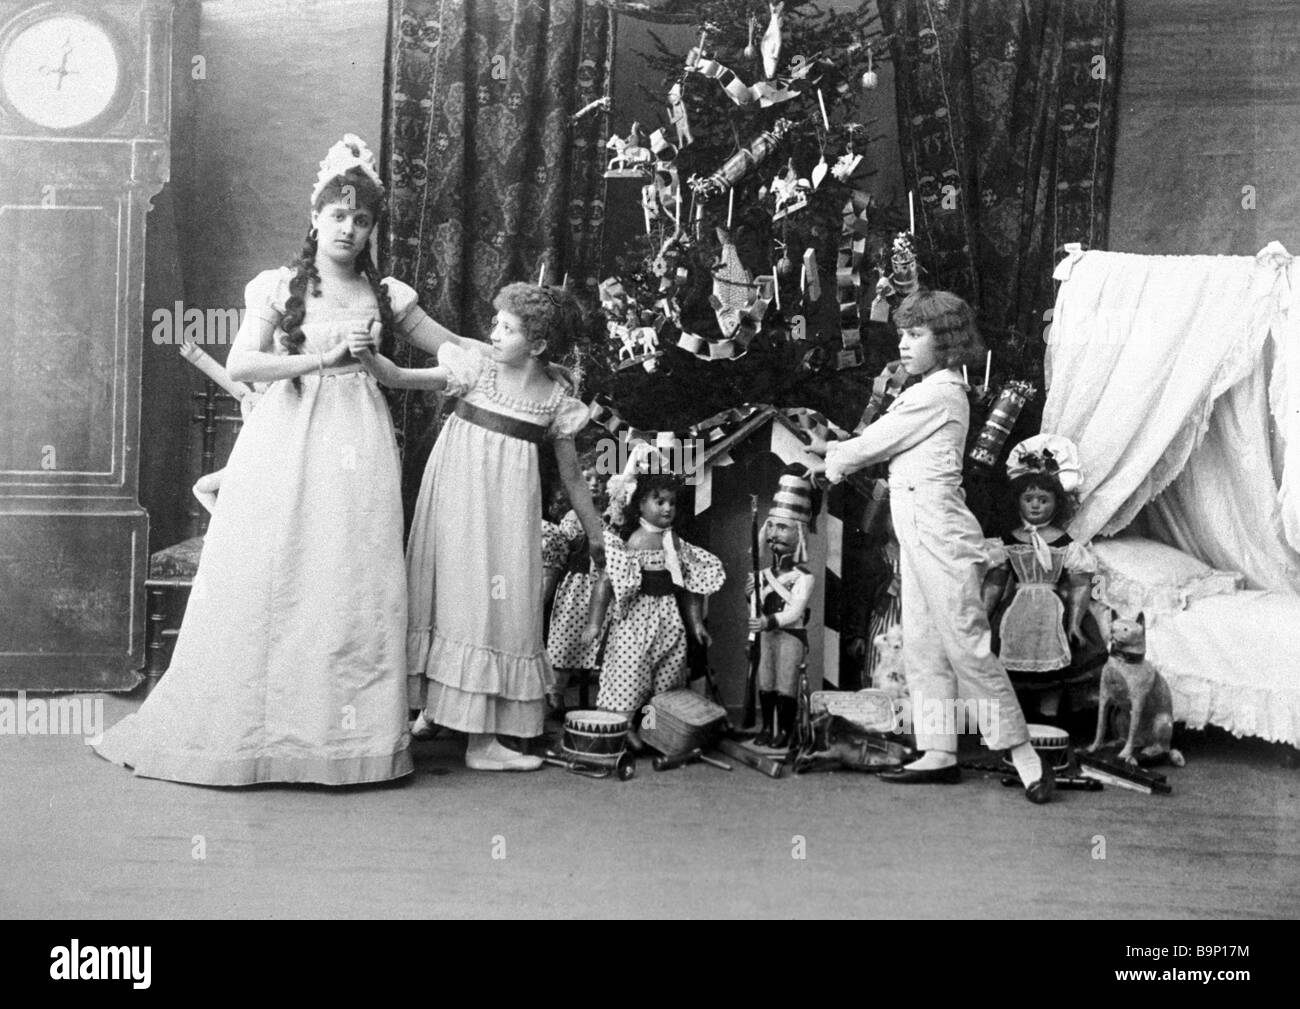 https://c8.alamy.com/comp/B9P17M/a-scene-from-pyotr-tchaikovsky-s-ballet-the-nutcracker-at-the-mariinsky-B9P17M.jpg